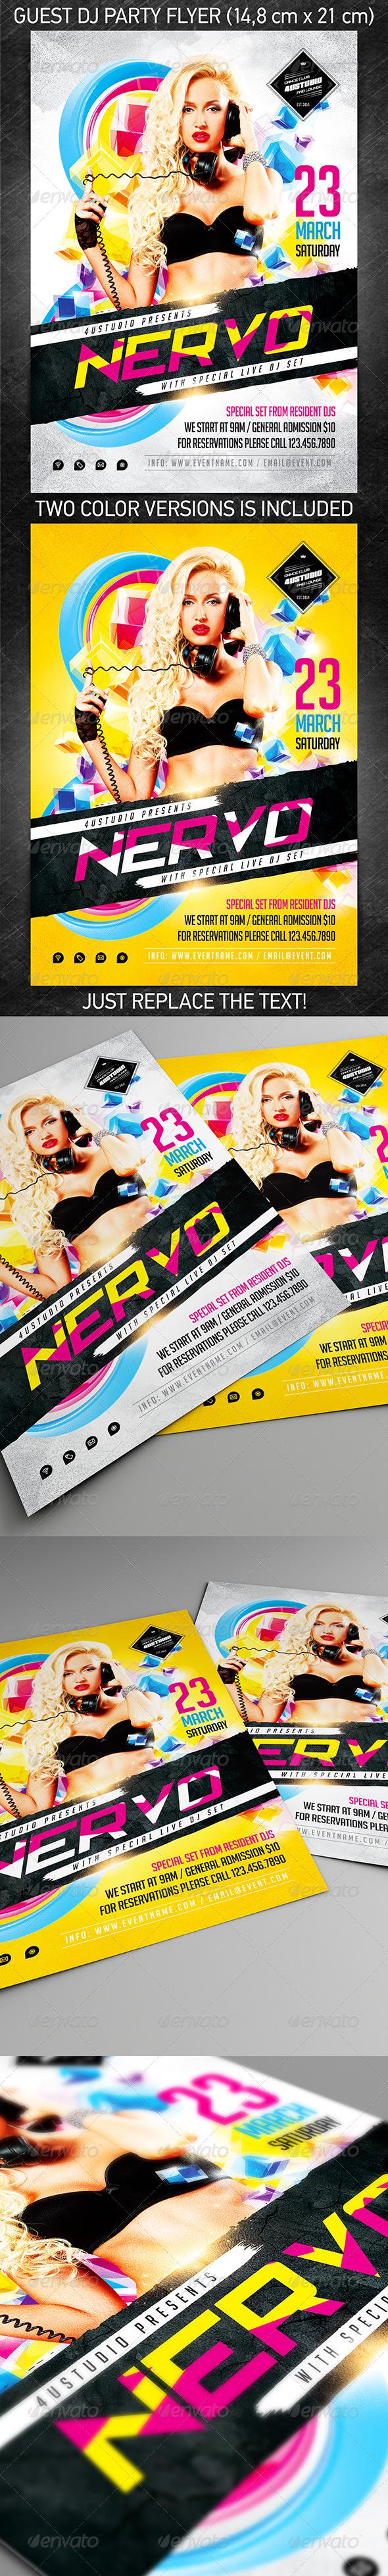 Guest DJ party flyer vol.3 - Clubs & Parties Events